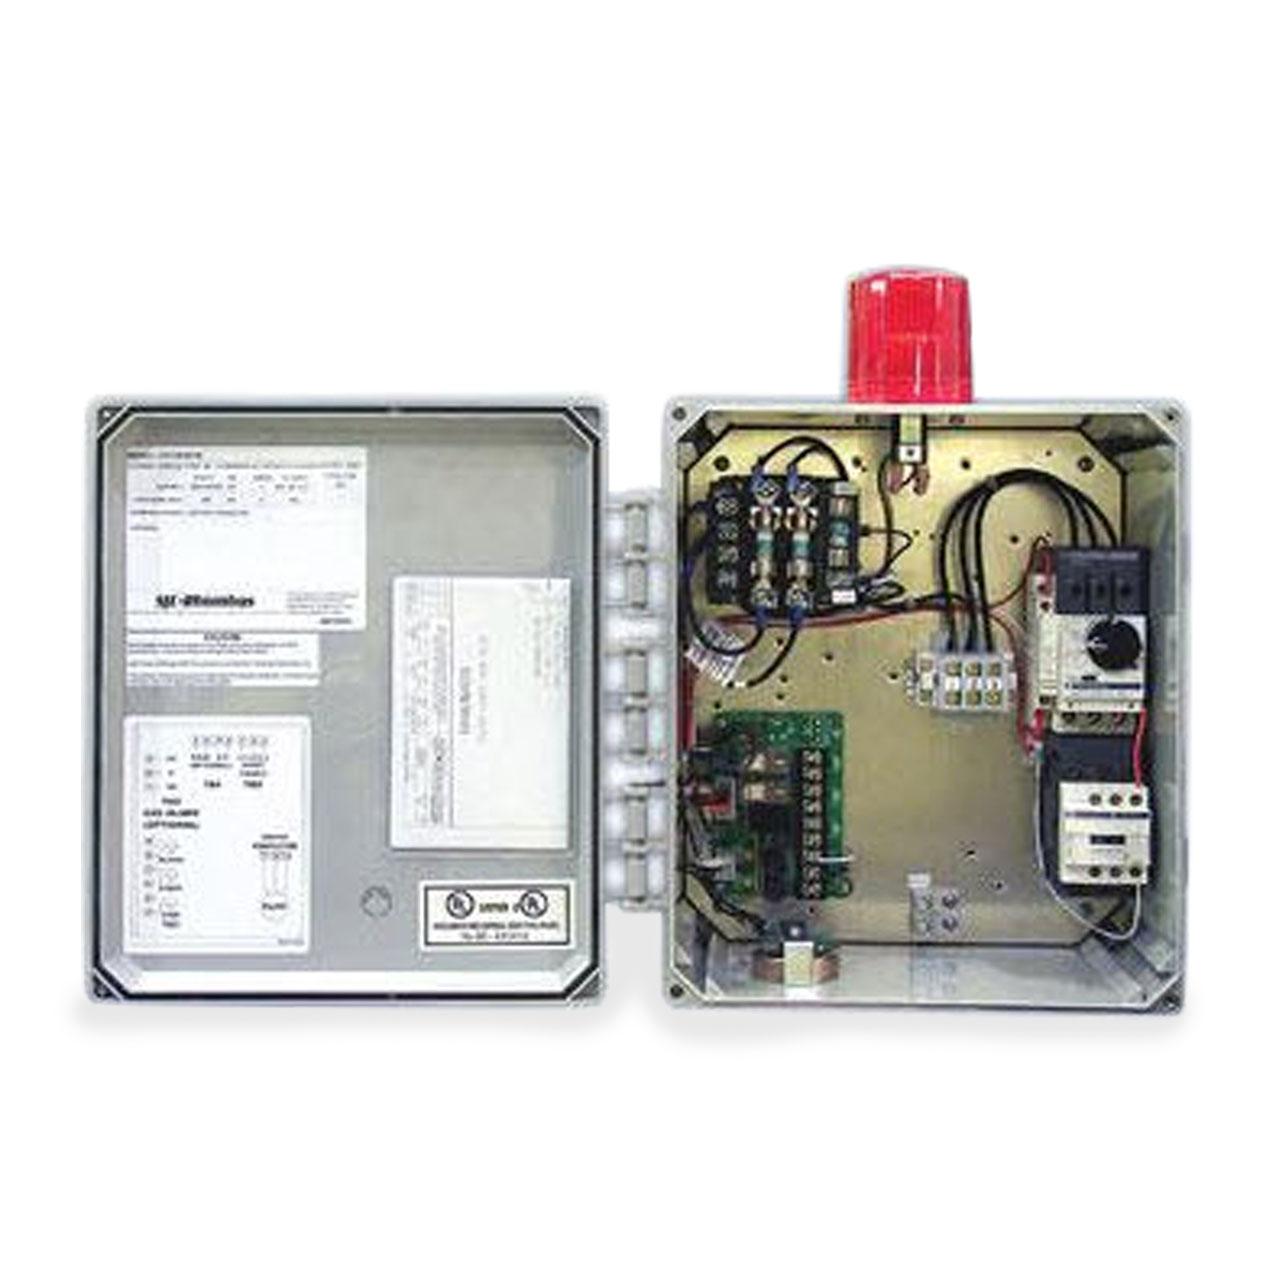 hight resolution of sje rhombus sje rhombus model 312 3 phase 208 240 480 600v simplex motor contactor control panel cp sje312